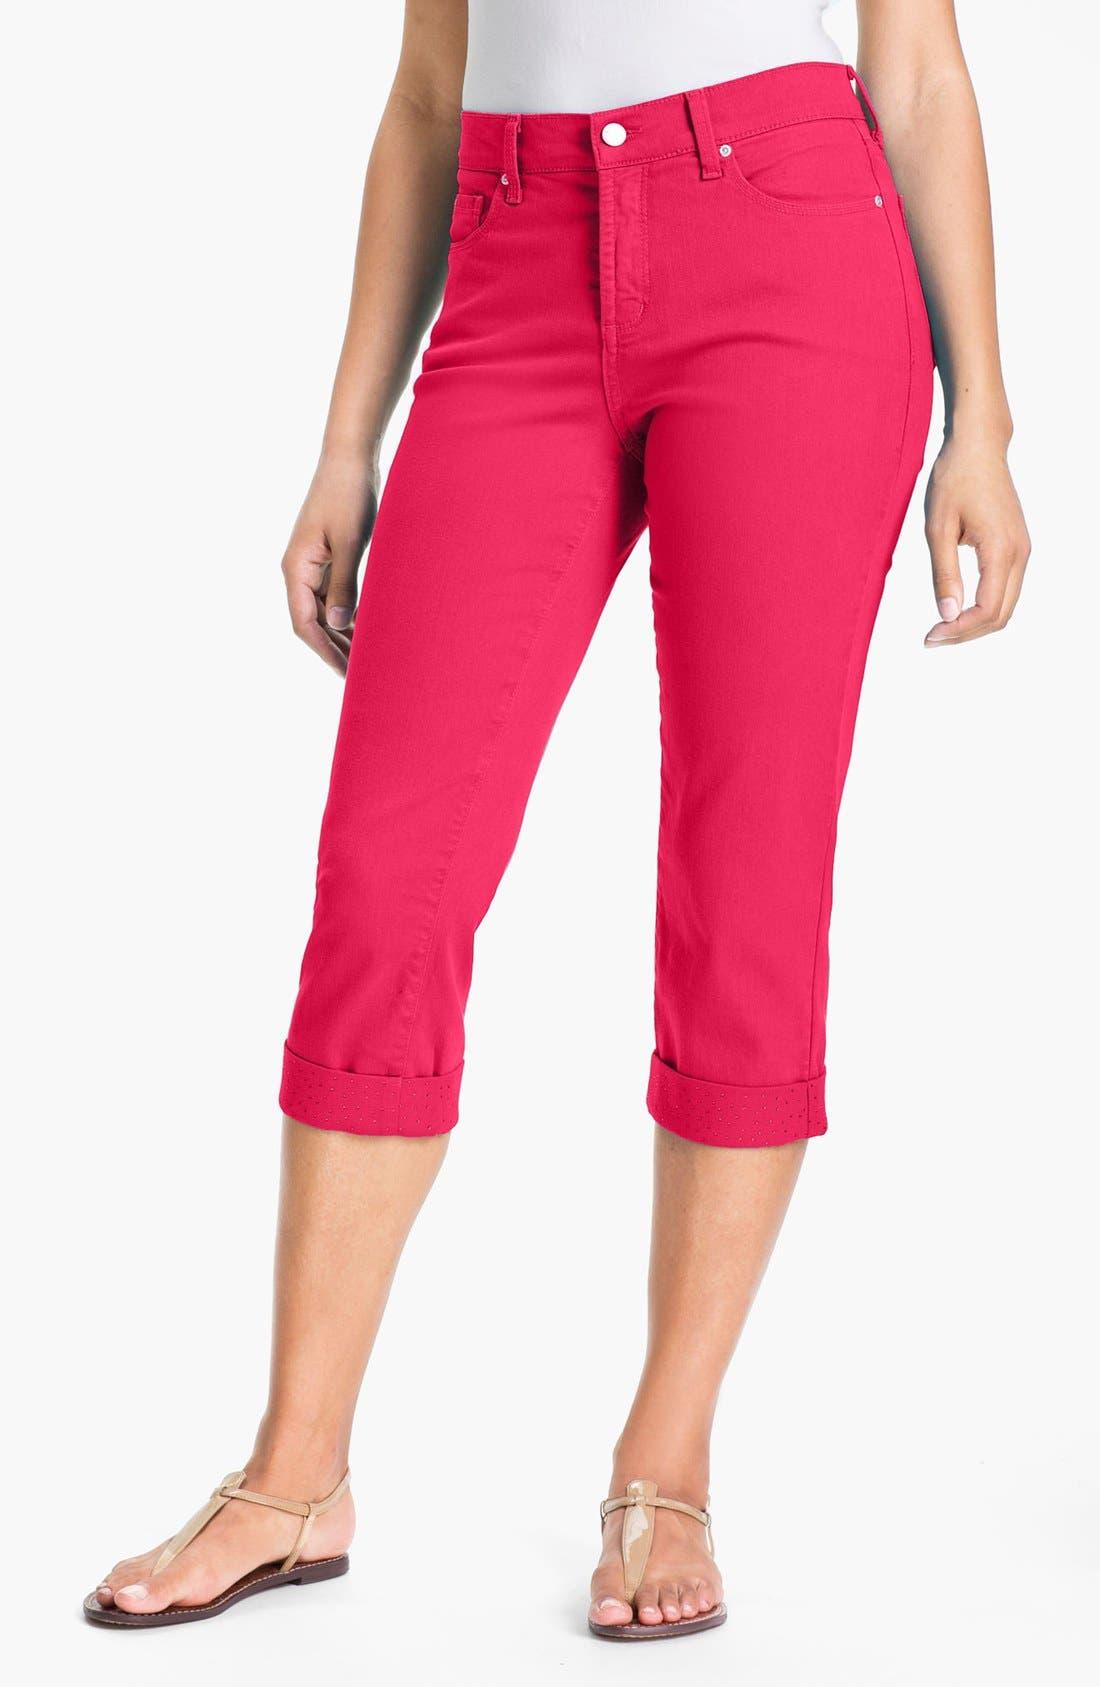 Alternate Image 1 Selected - NYDJ 'Alyssia' Embellished Crop Jeans (Petite)